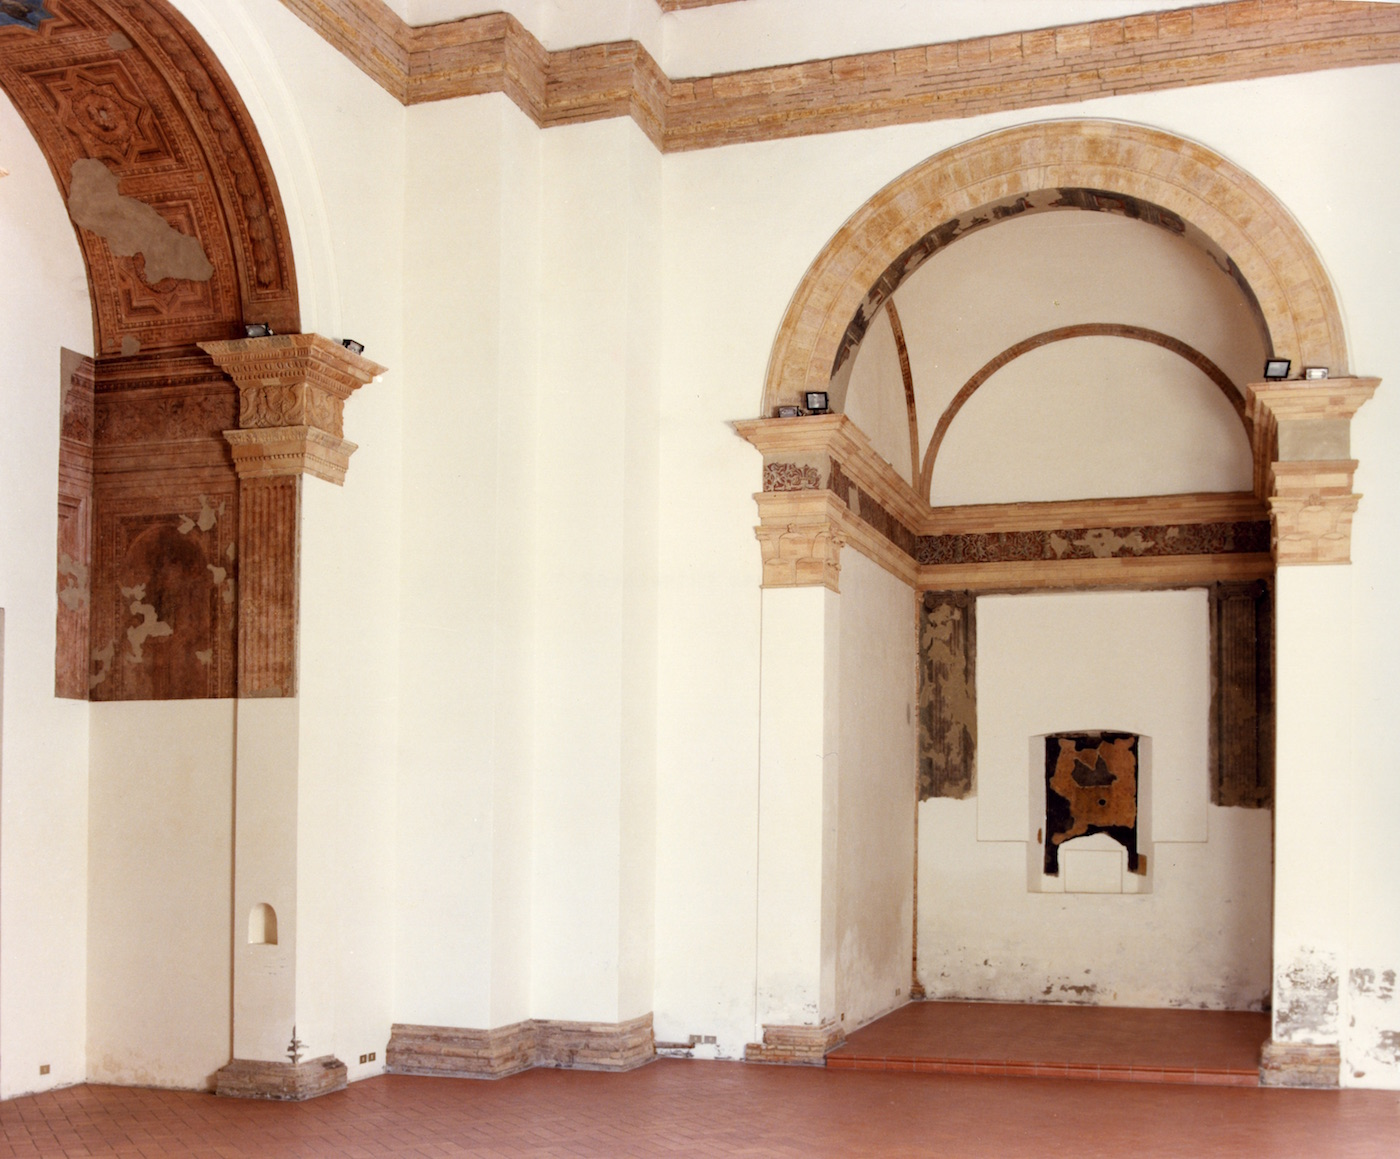 Oratorio San Sebastiano, Forlì. Foto: Walter Molfese